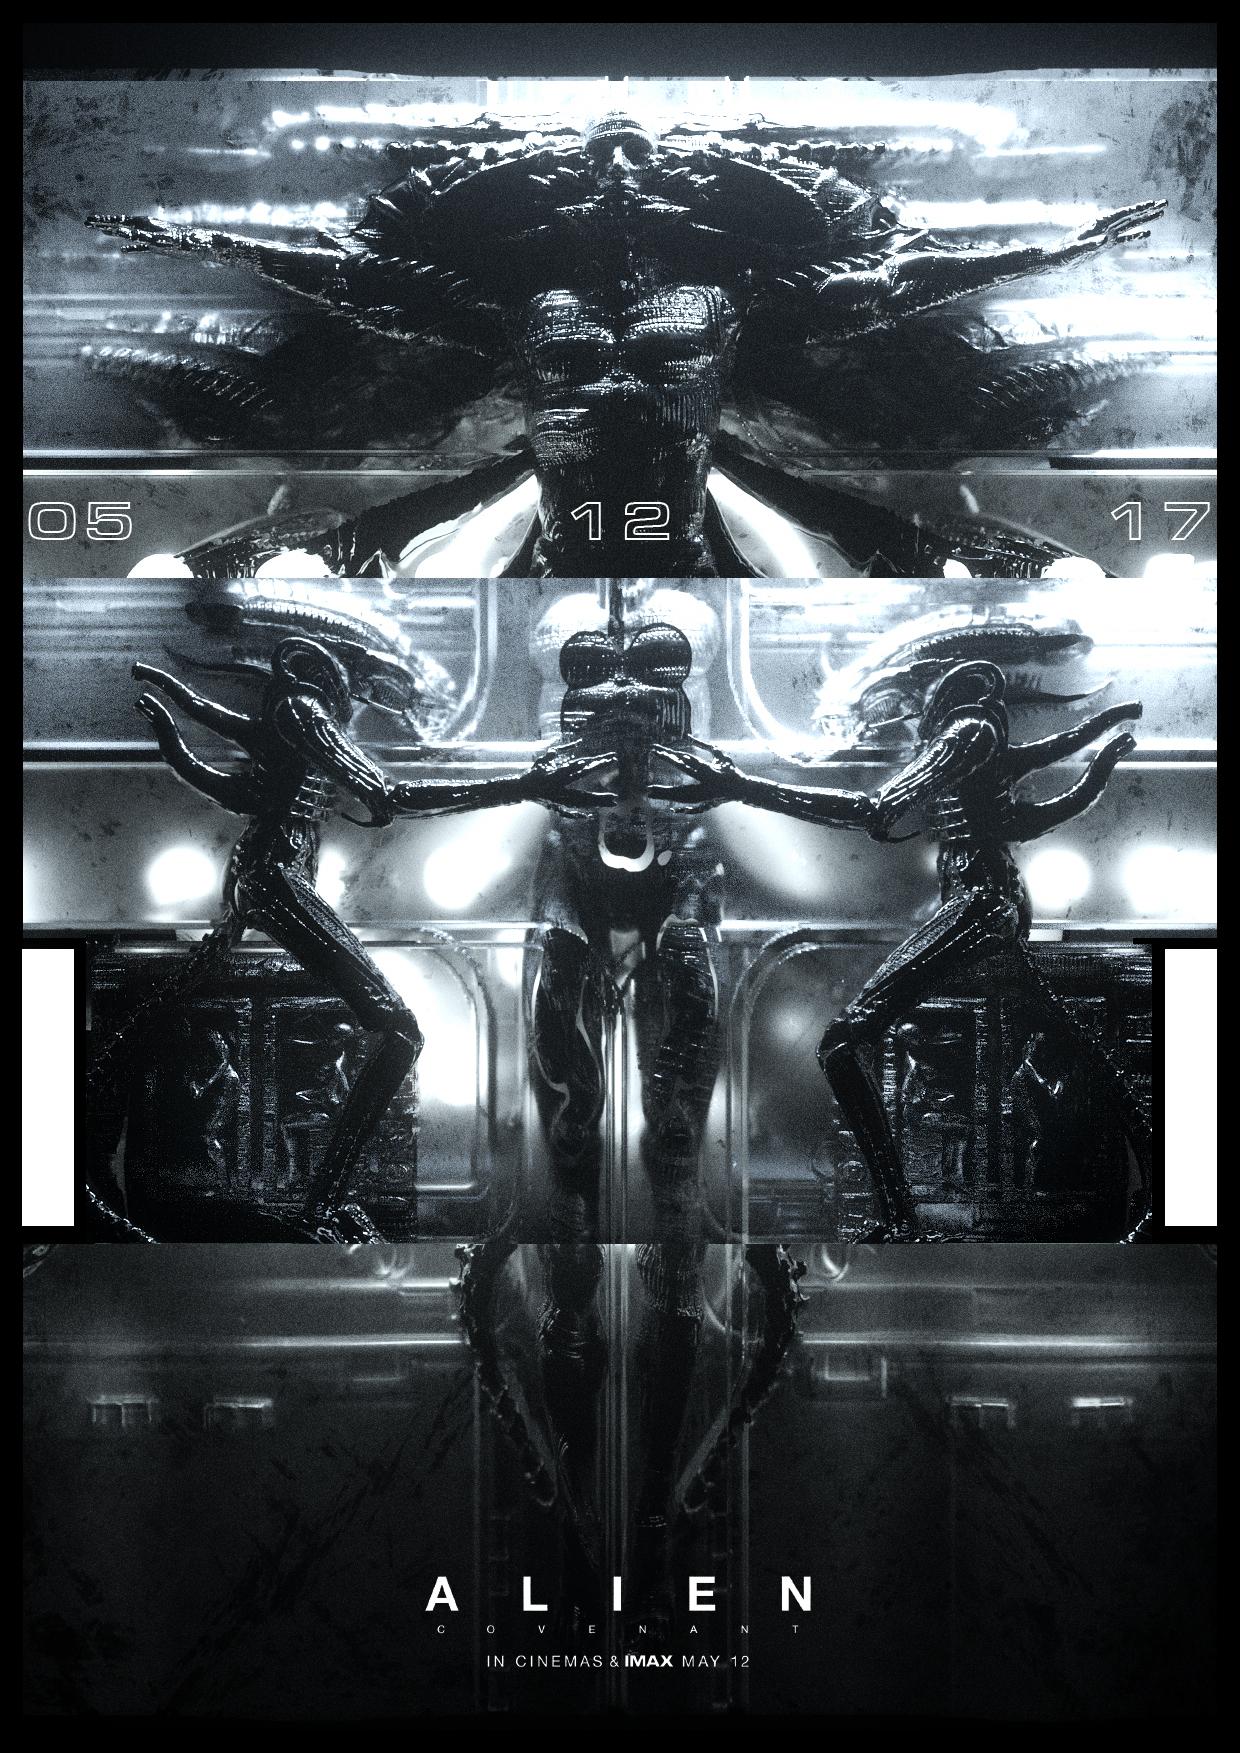 _AlienScanV2 copy.jpg